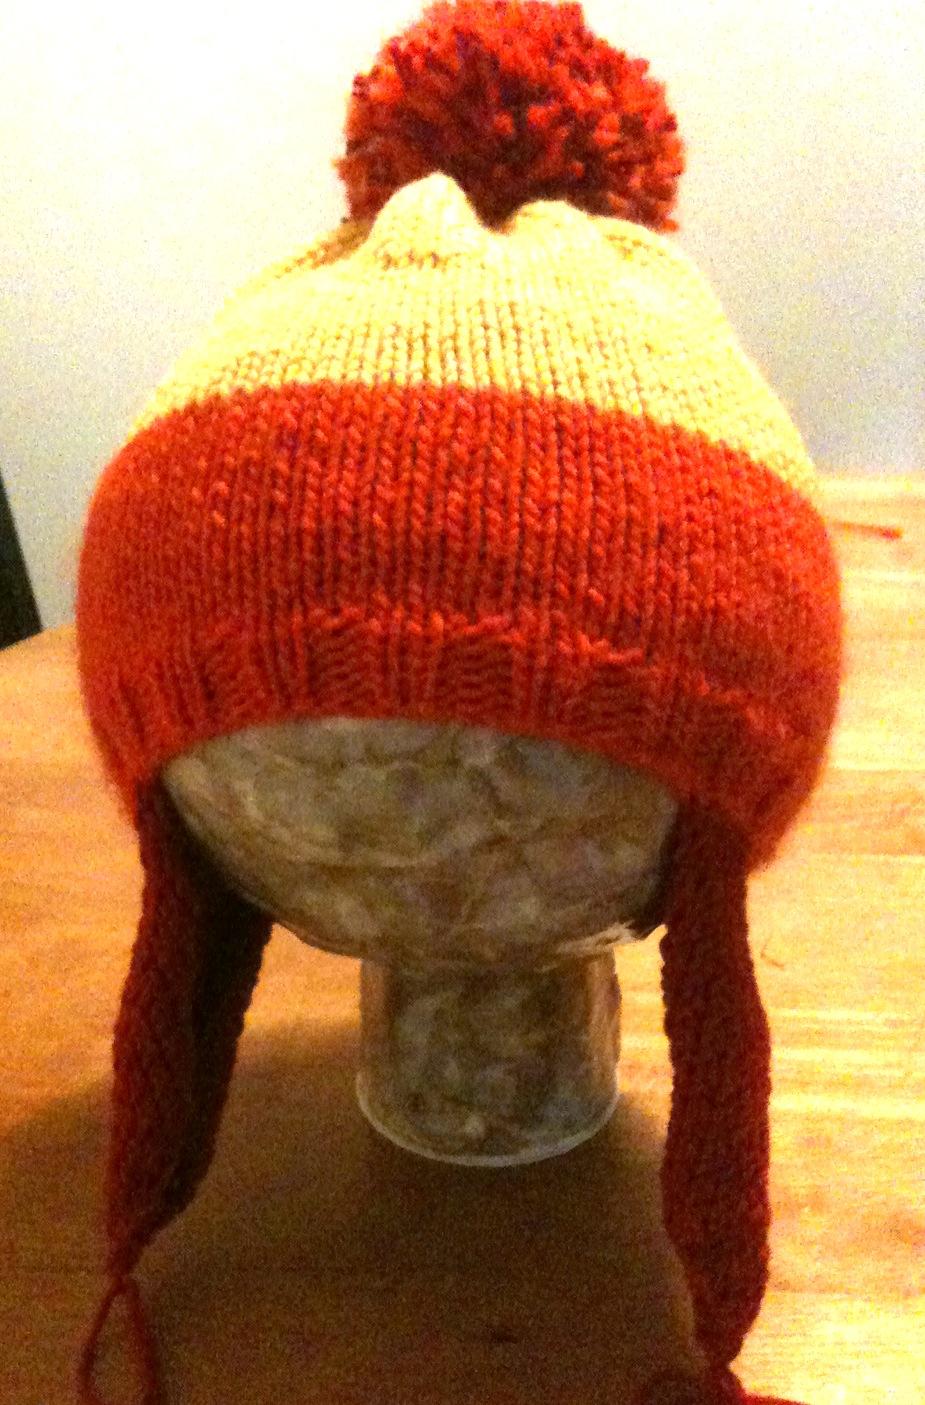 Kusala Knitworks: Obsession aka Geeky Knitter